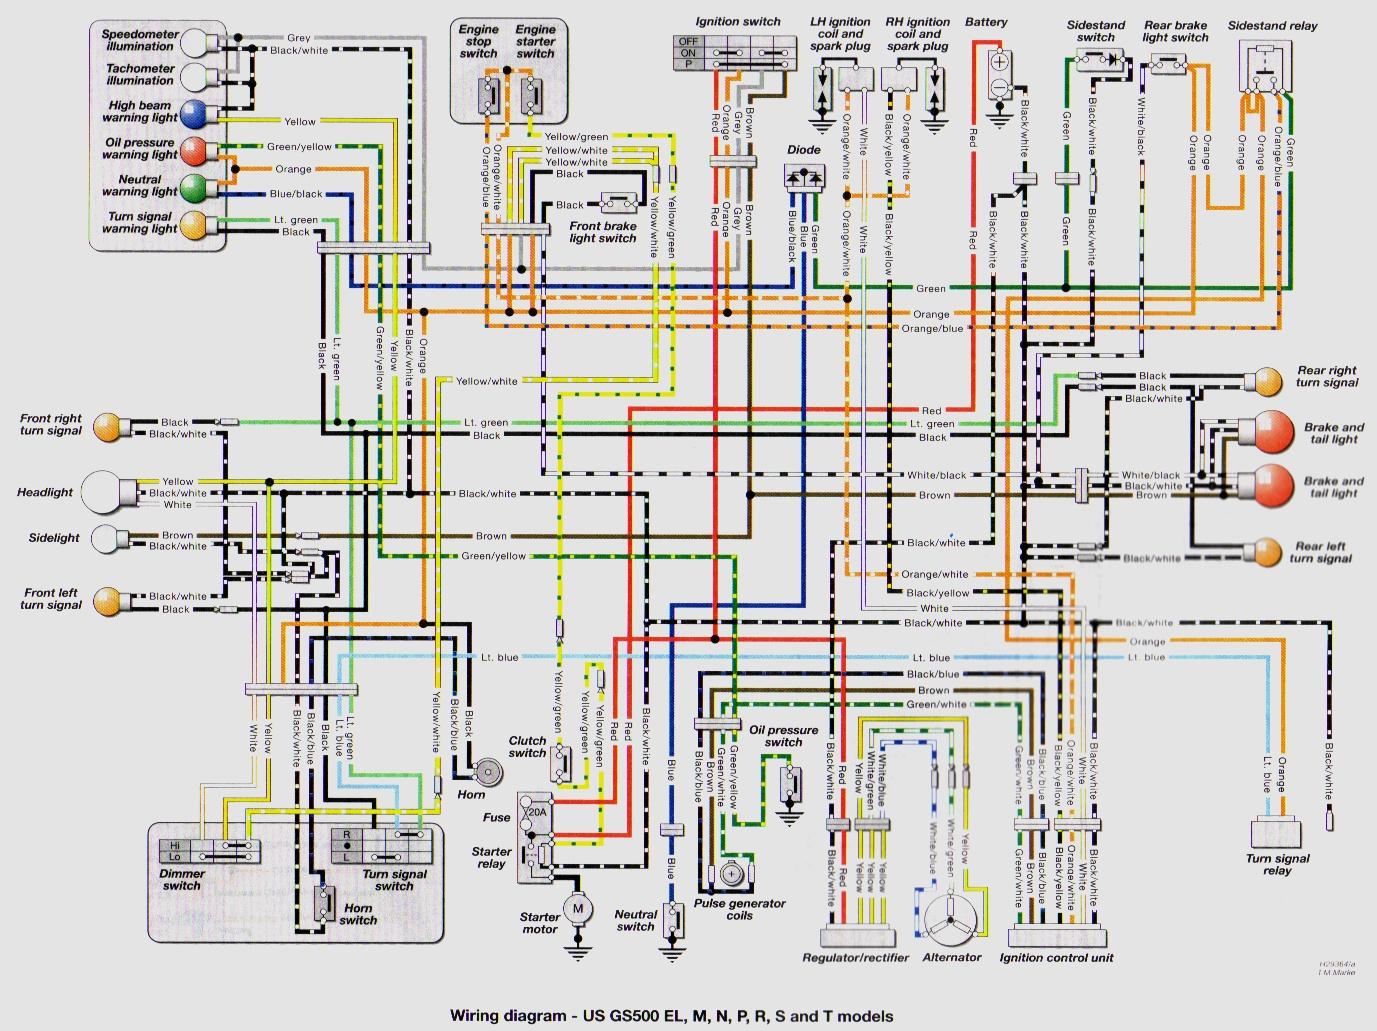 hight resolution of haynes wiring diagram wiring diagram blog haynes wiring diagrams download haynes wiring diagram